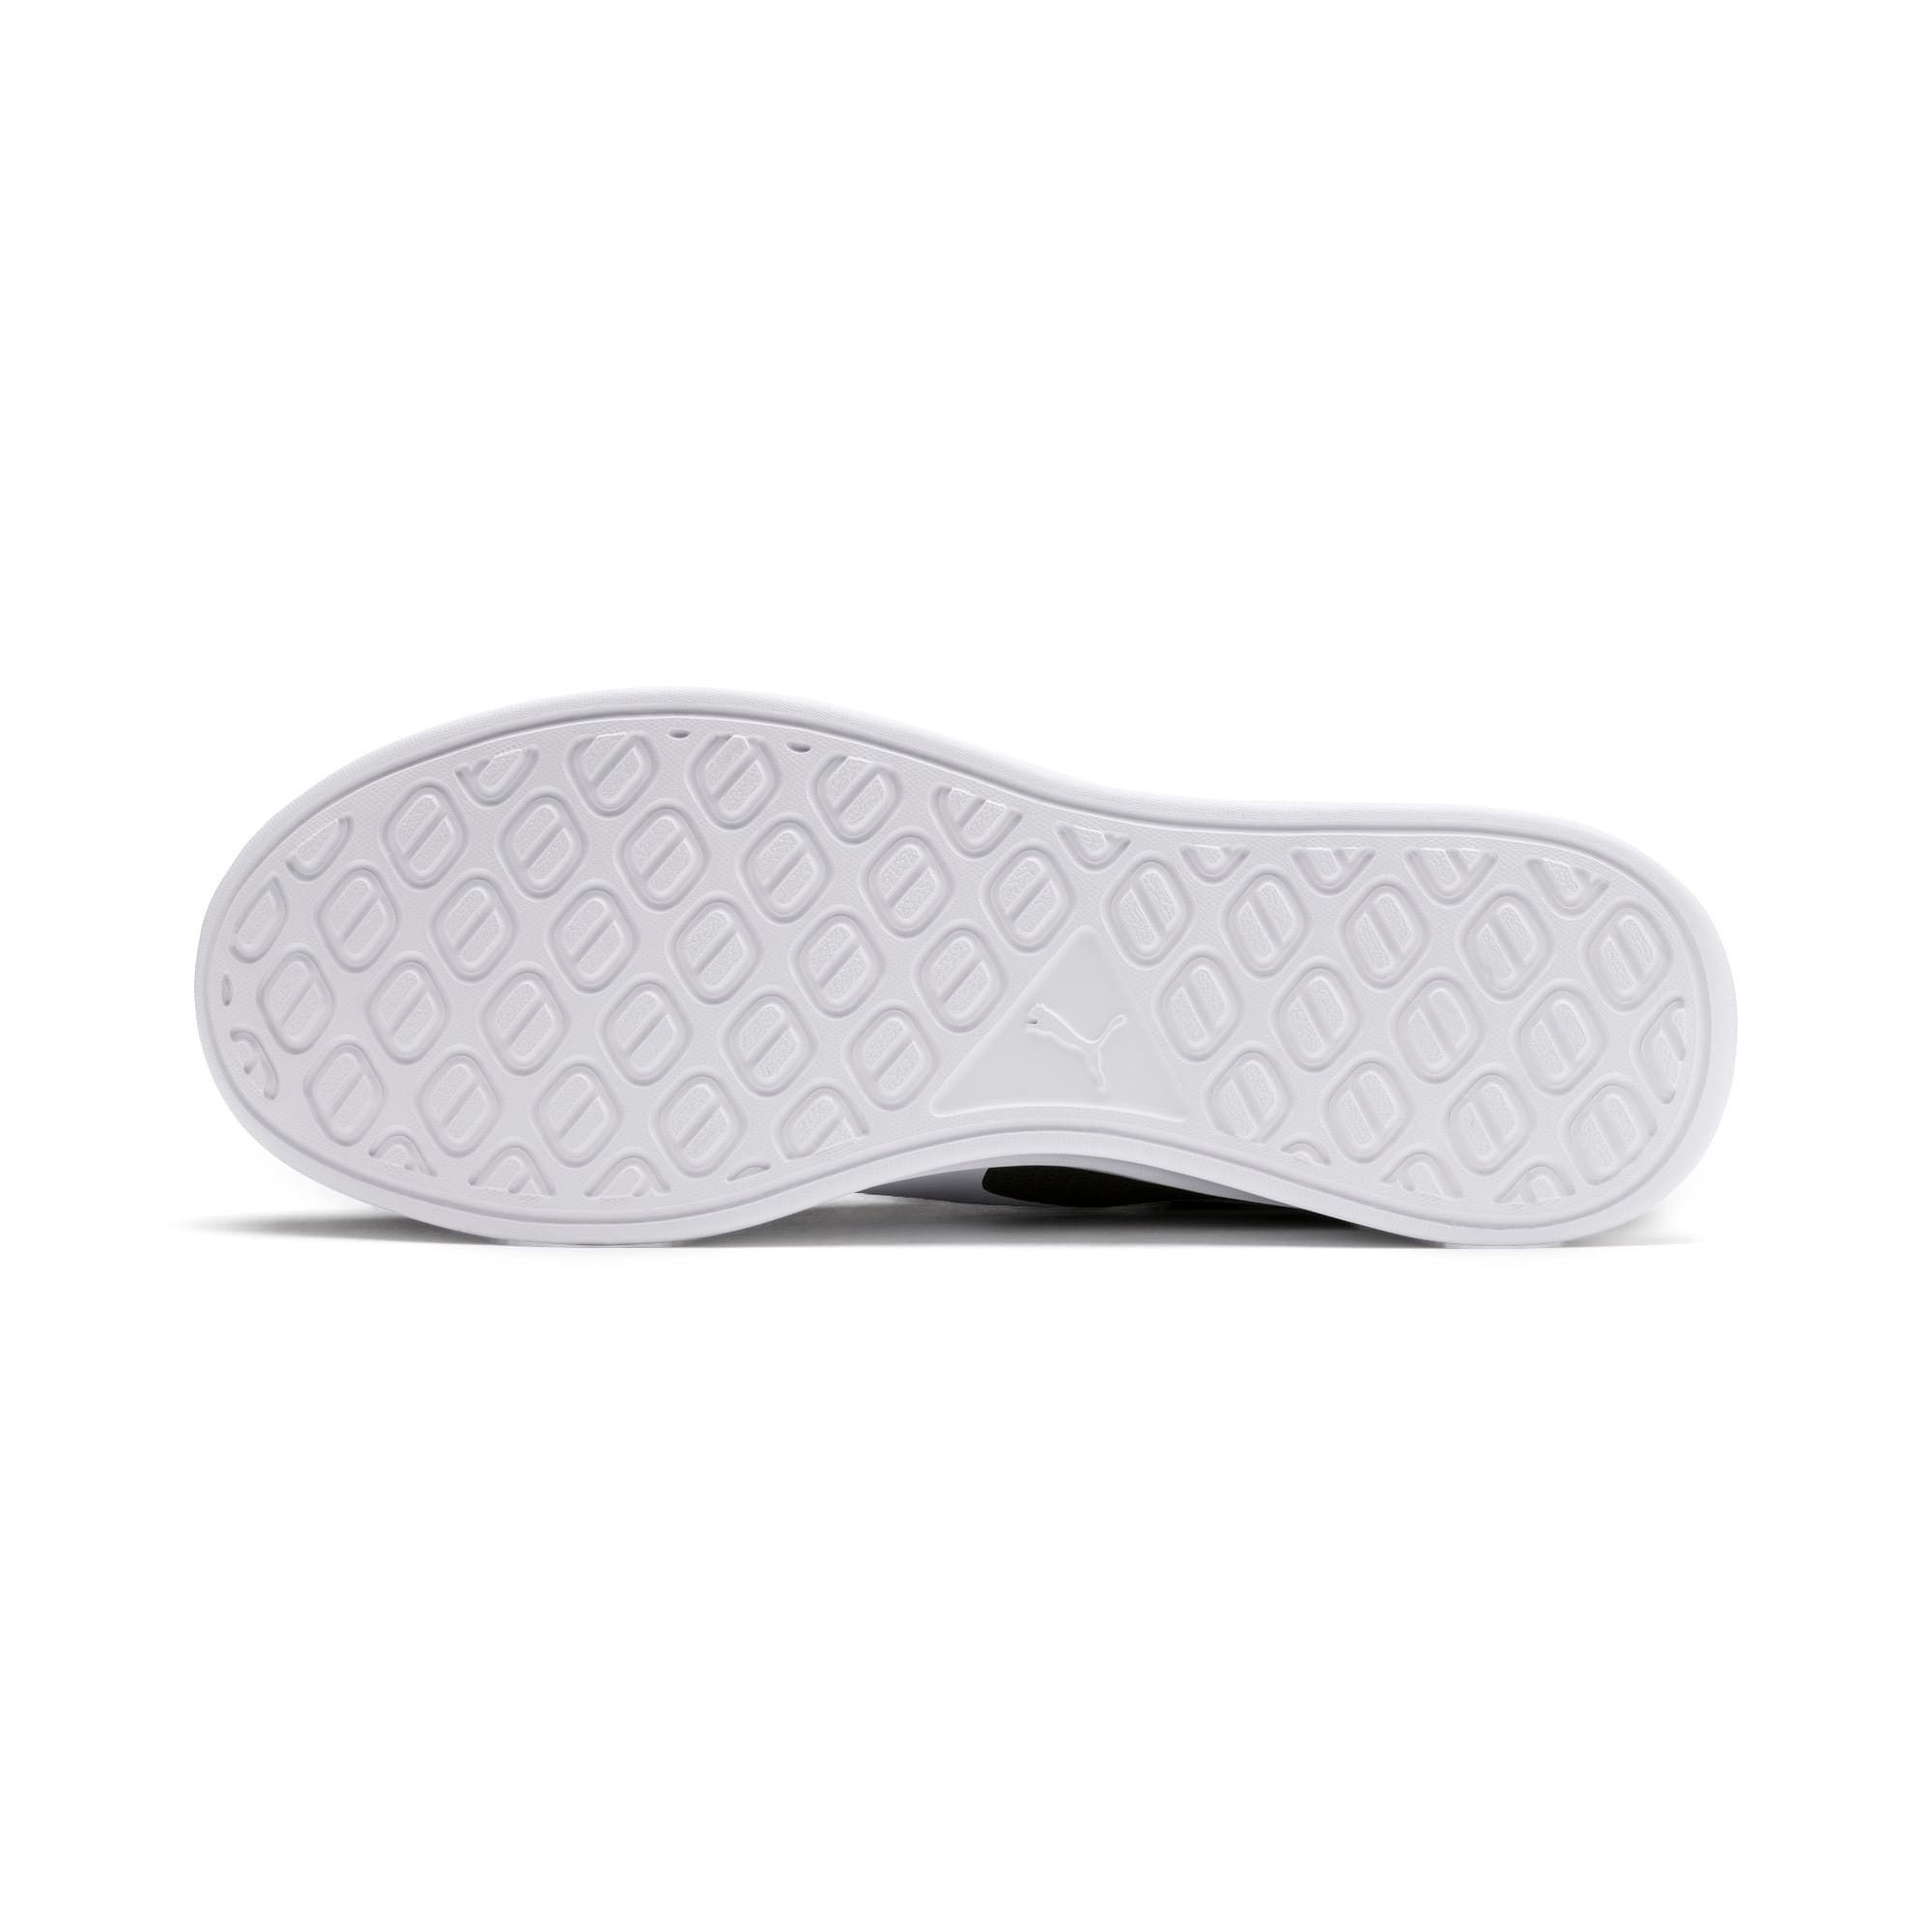 Thumbnail 6 of Modern Runner Sneakers, Puma Black-Puma White, medium-IND